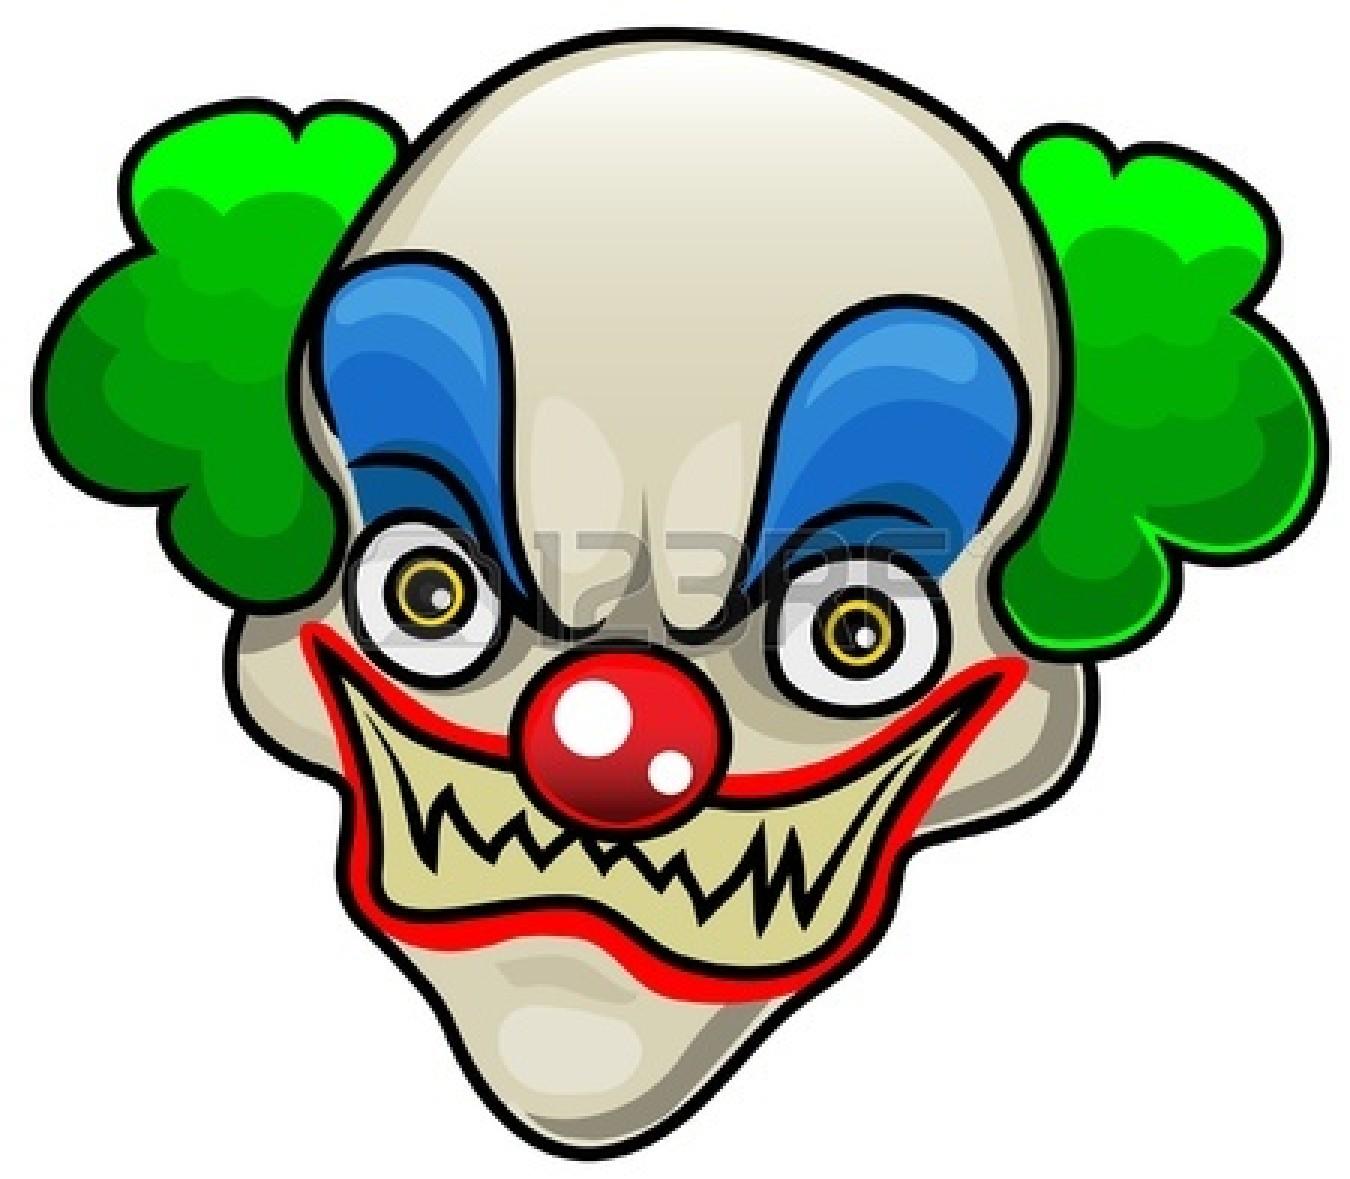 1350x1179 Scary Clown Clipart Many Interesting Cliparts